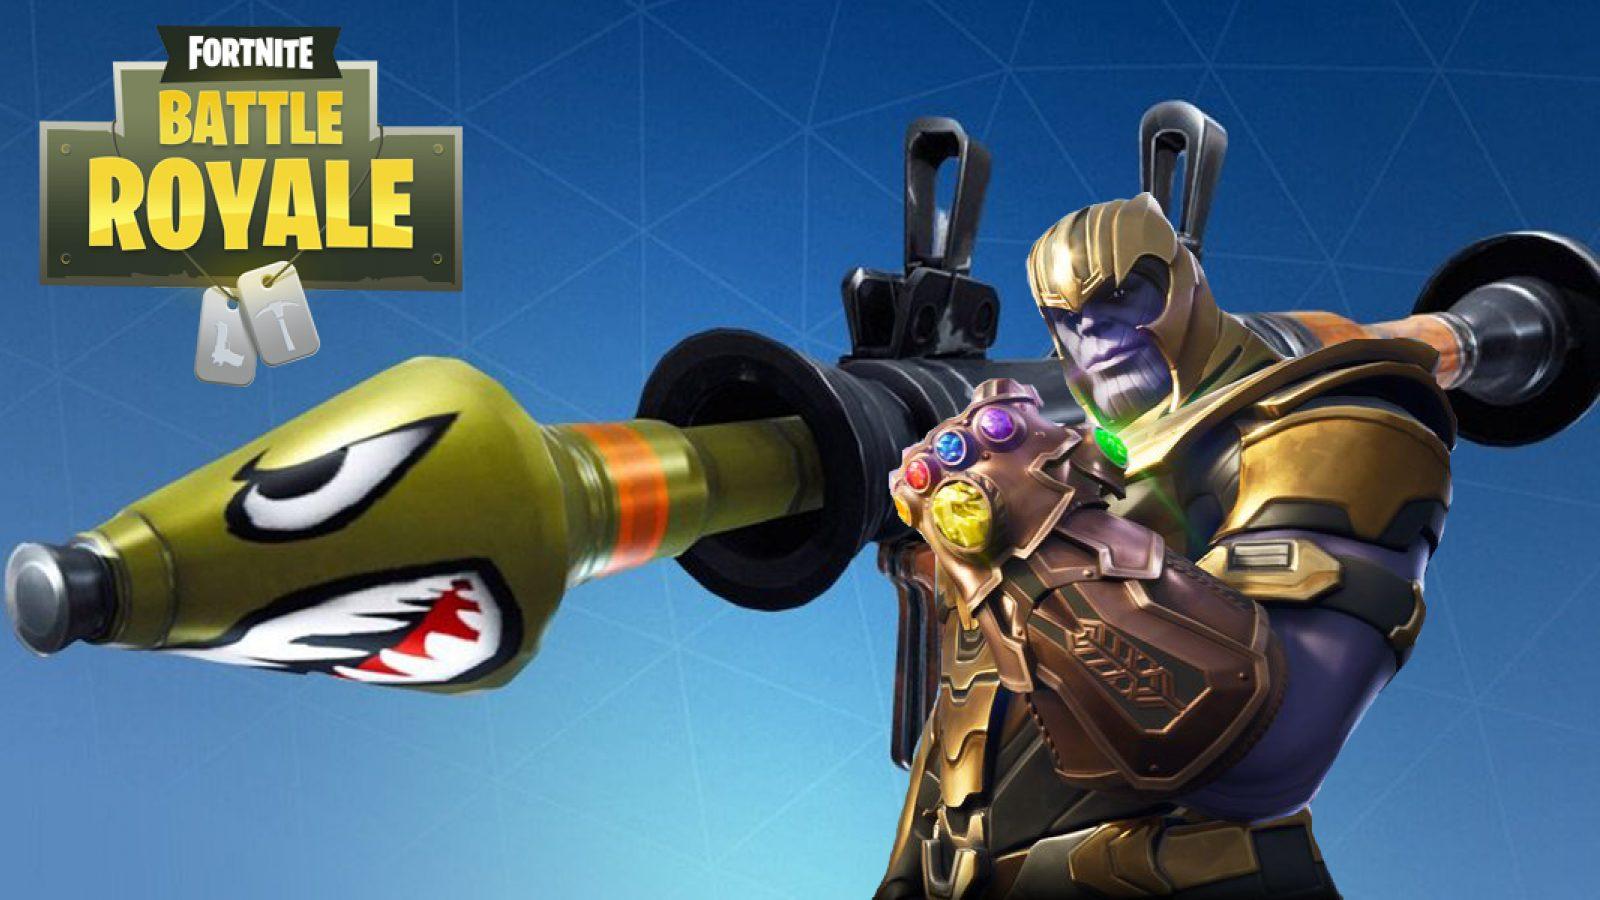 Thanos Accidentally Rocket Rides During Intense Fortnite Battle 1600x900